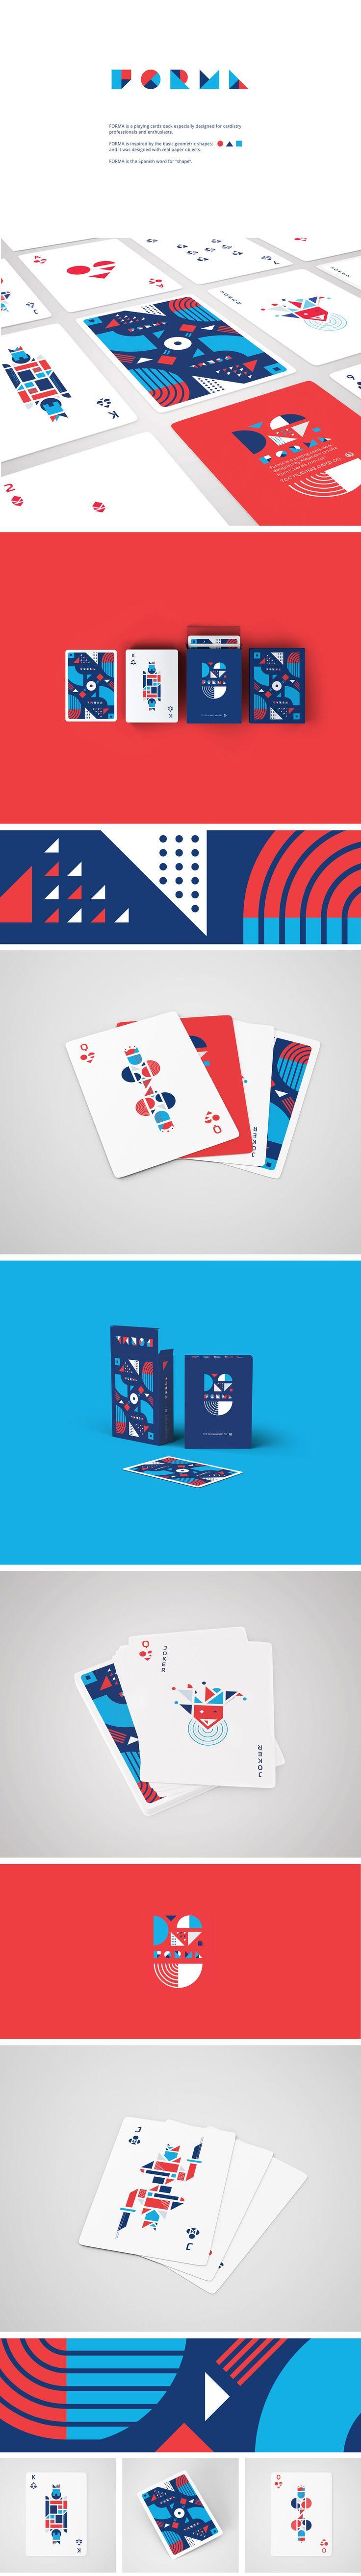 """FORMA card deck"" by Ale Urrutia"